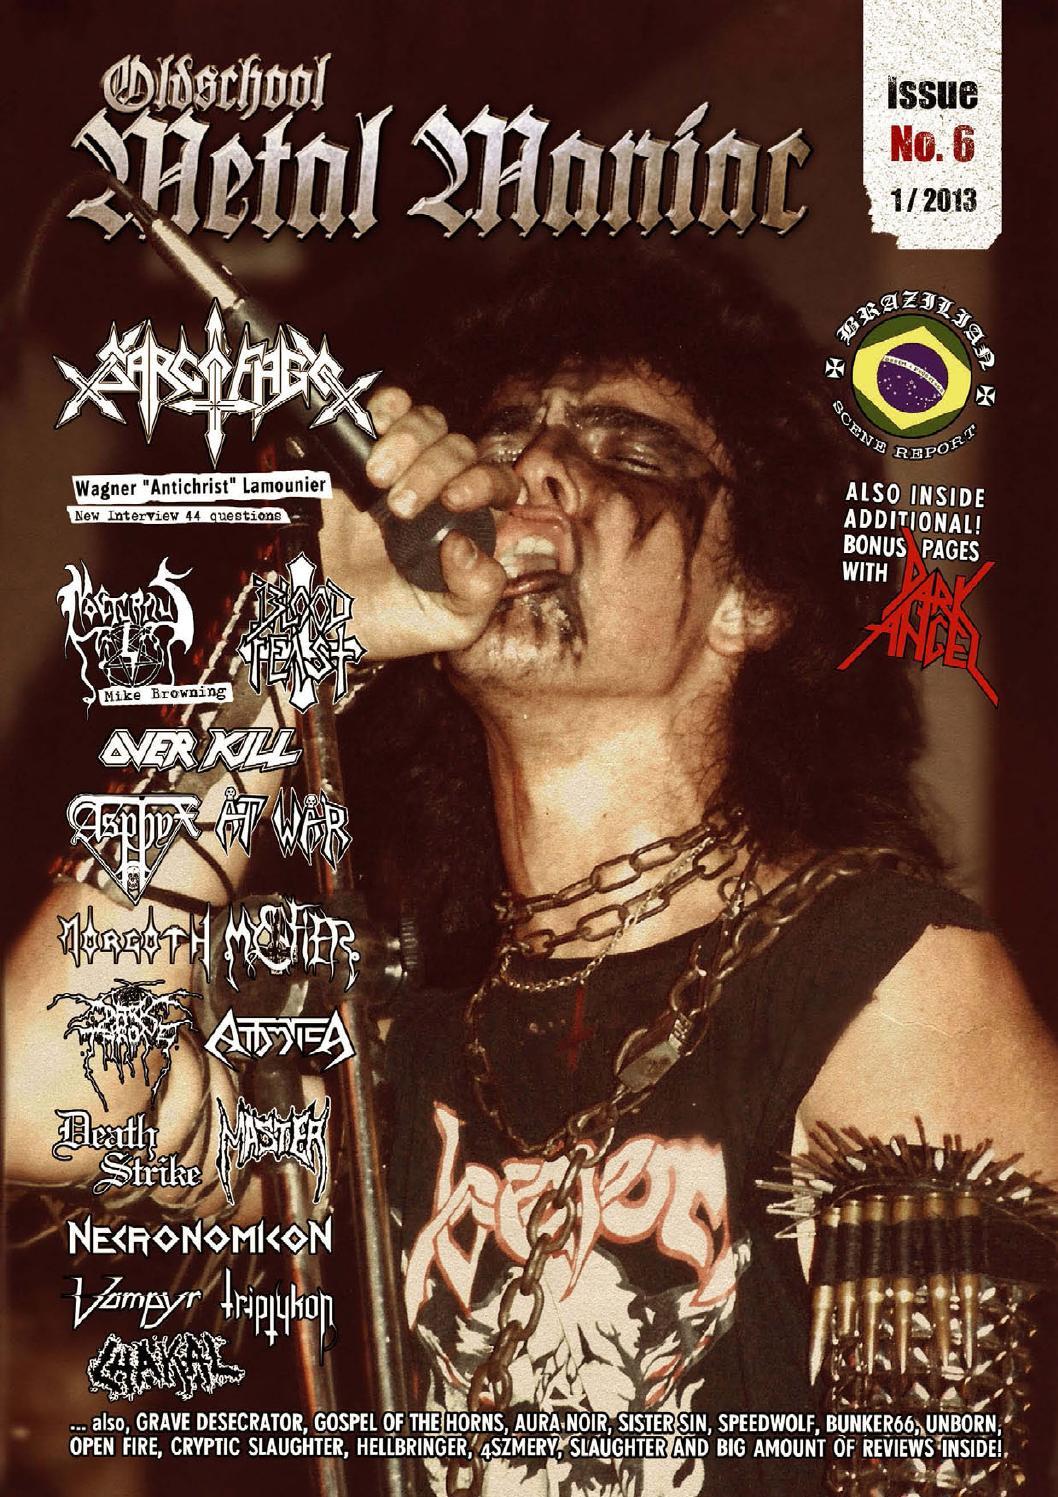 Oldschool Metal Maniac Magazine - Issue #6 by Oldschool